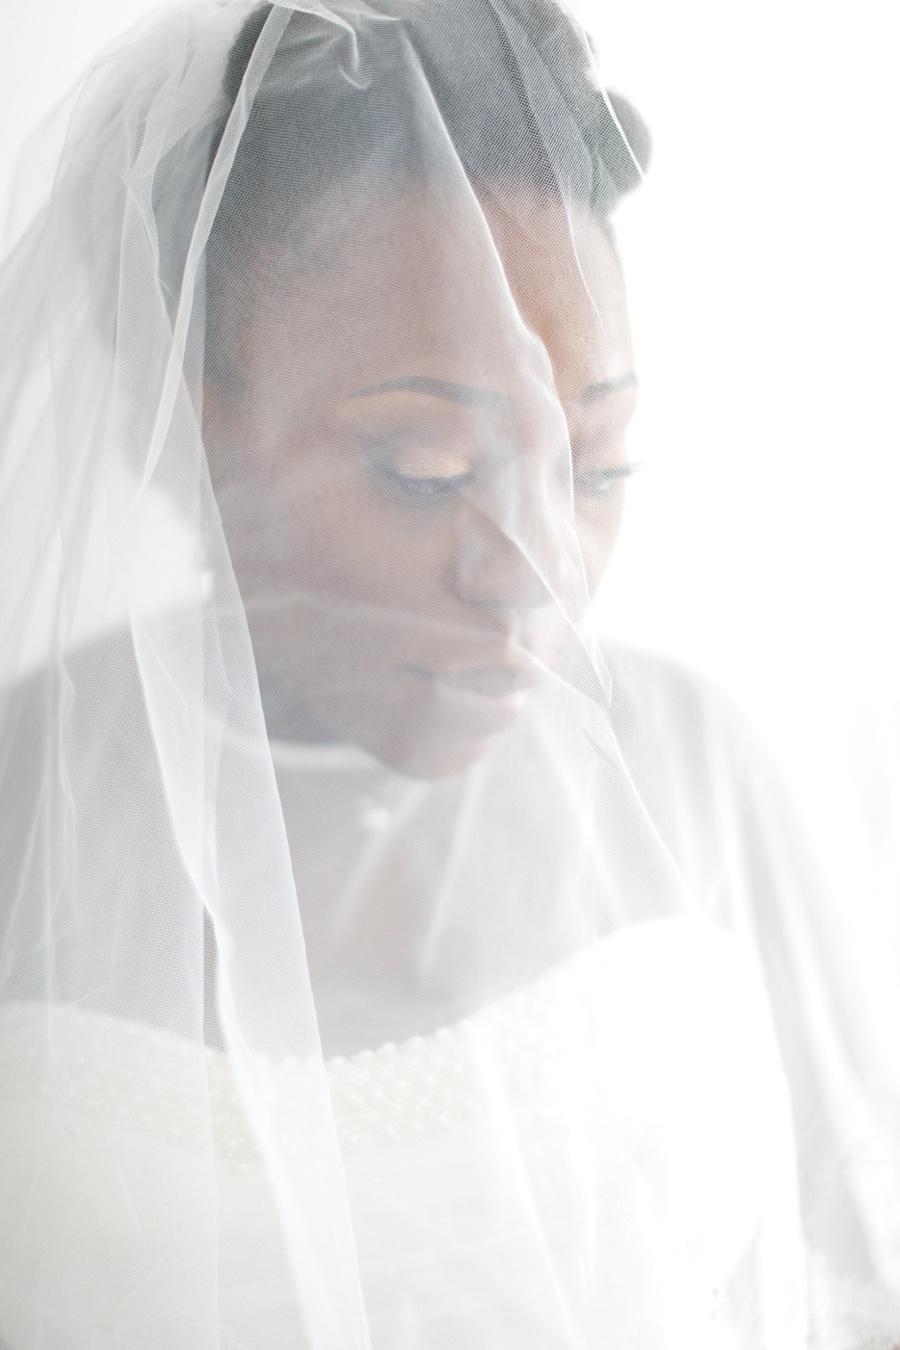 mariage_pavillon-d-armenonville-nadege-arthur-photographe-nicolas_saurin-199